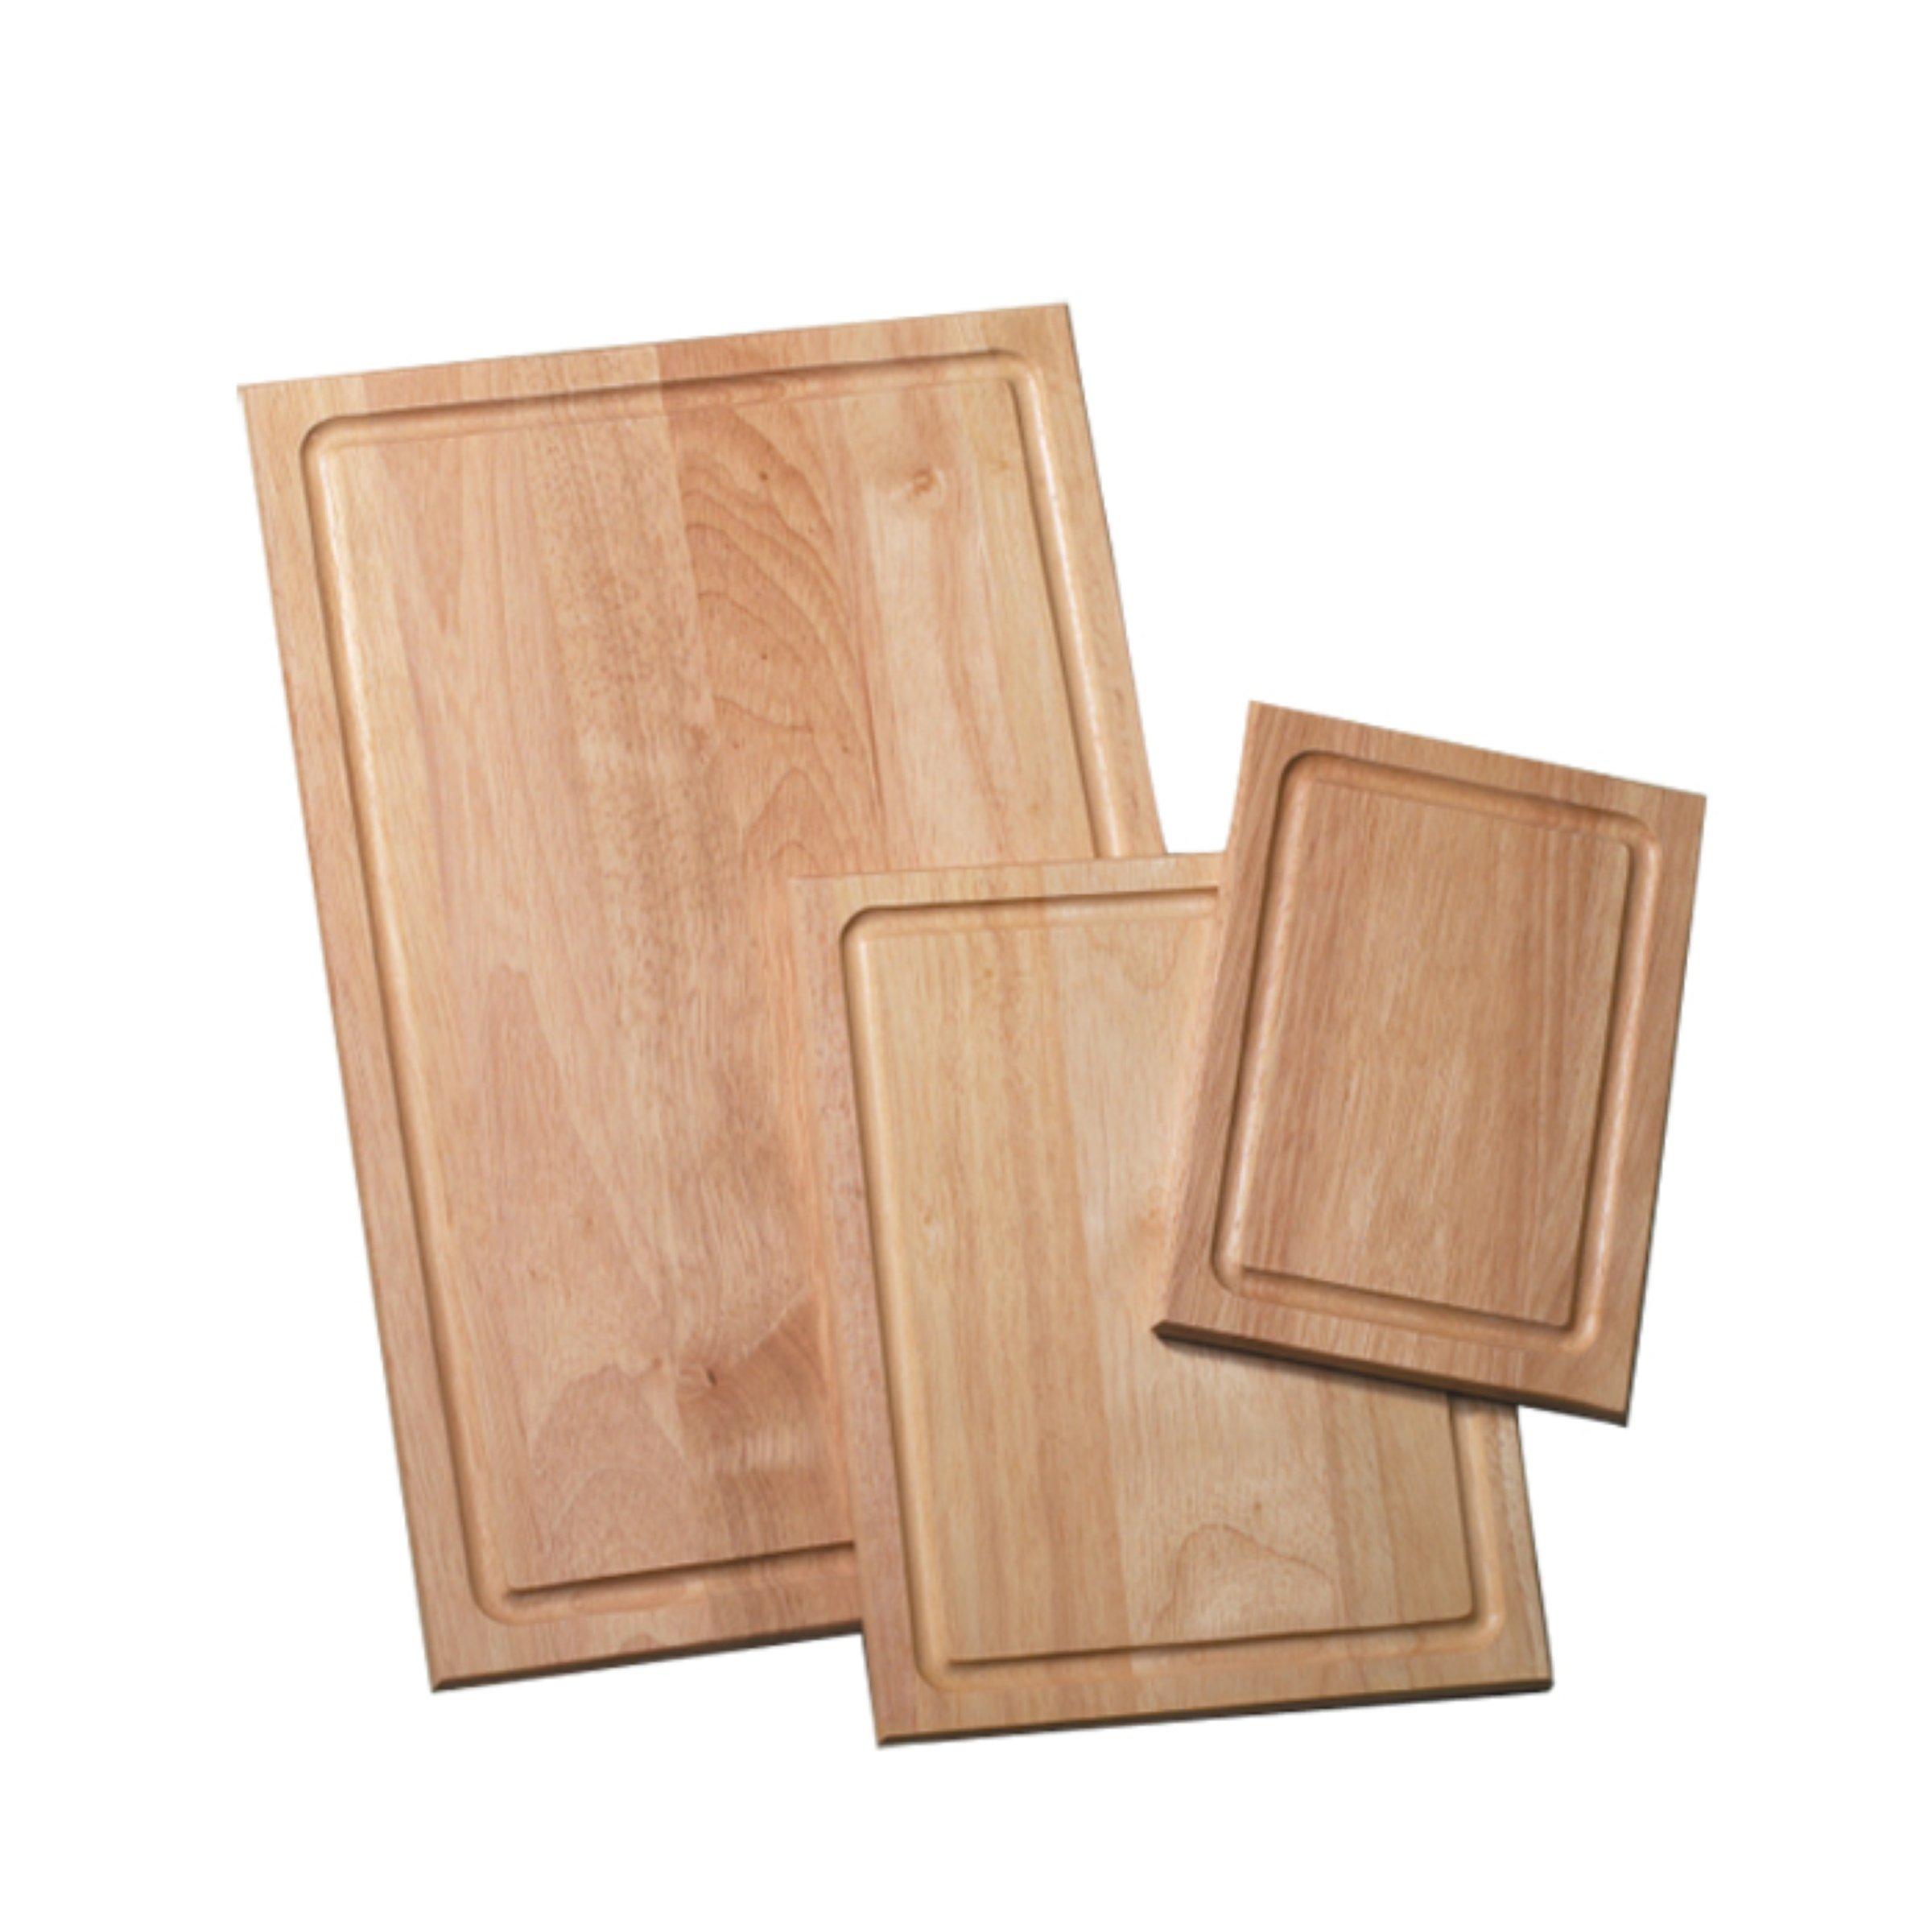 Farberware 3-Piece Wood Cutting Board Set with Drip Groove